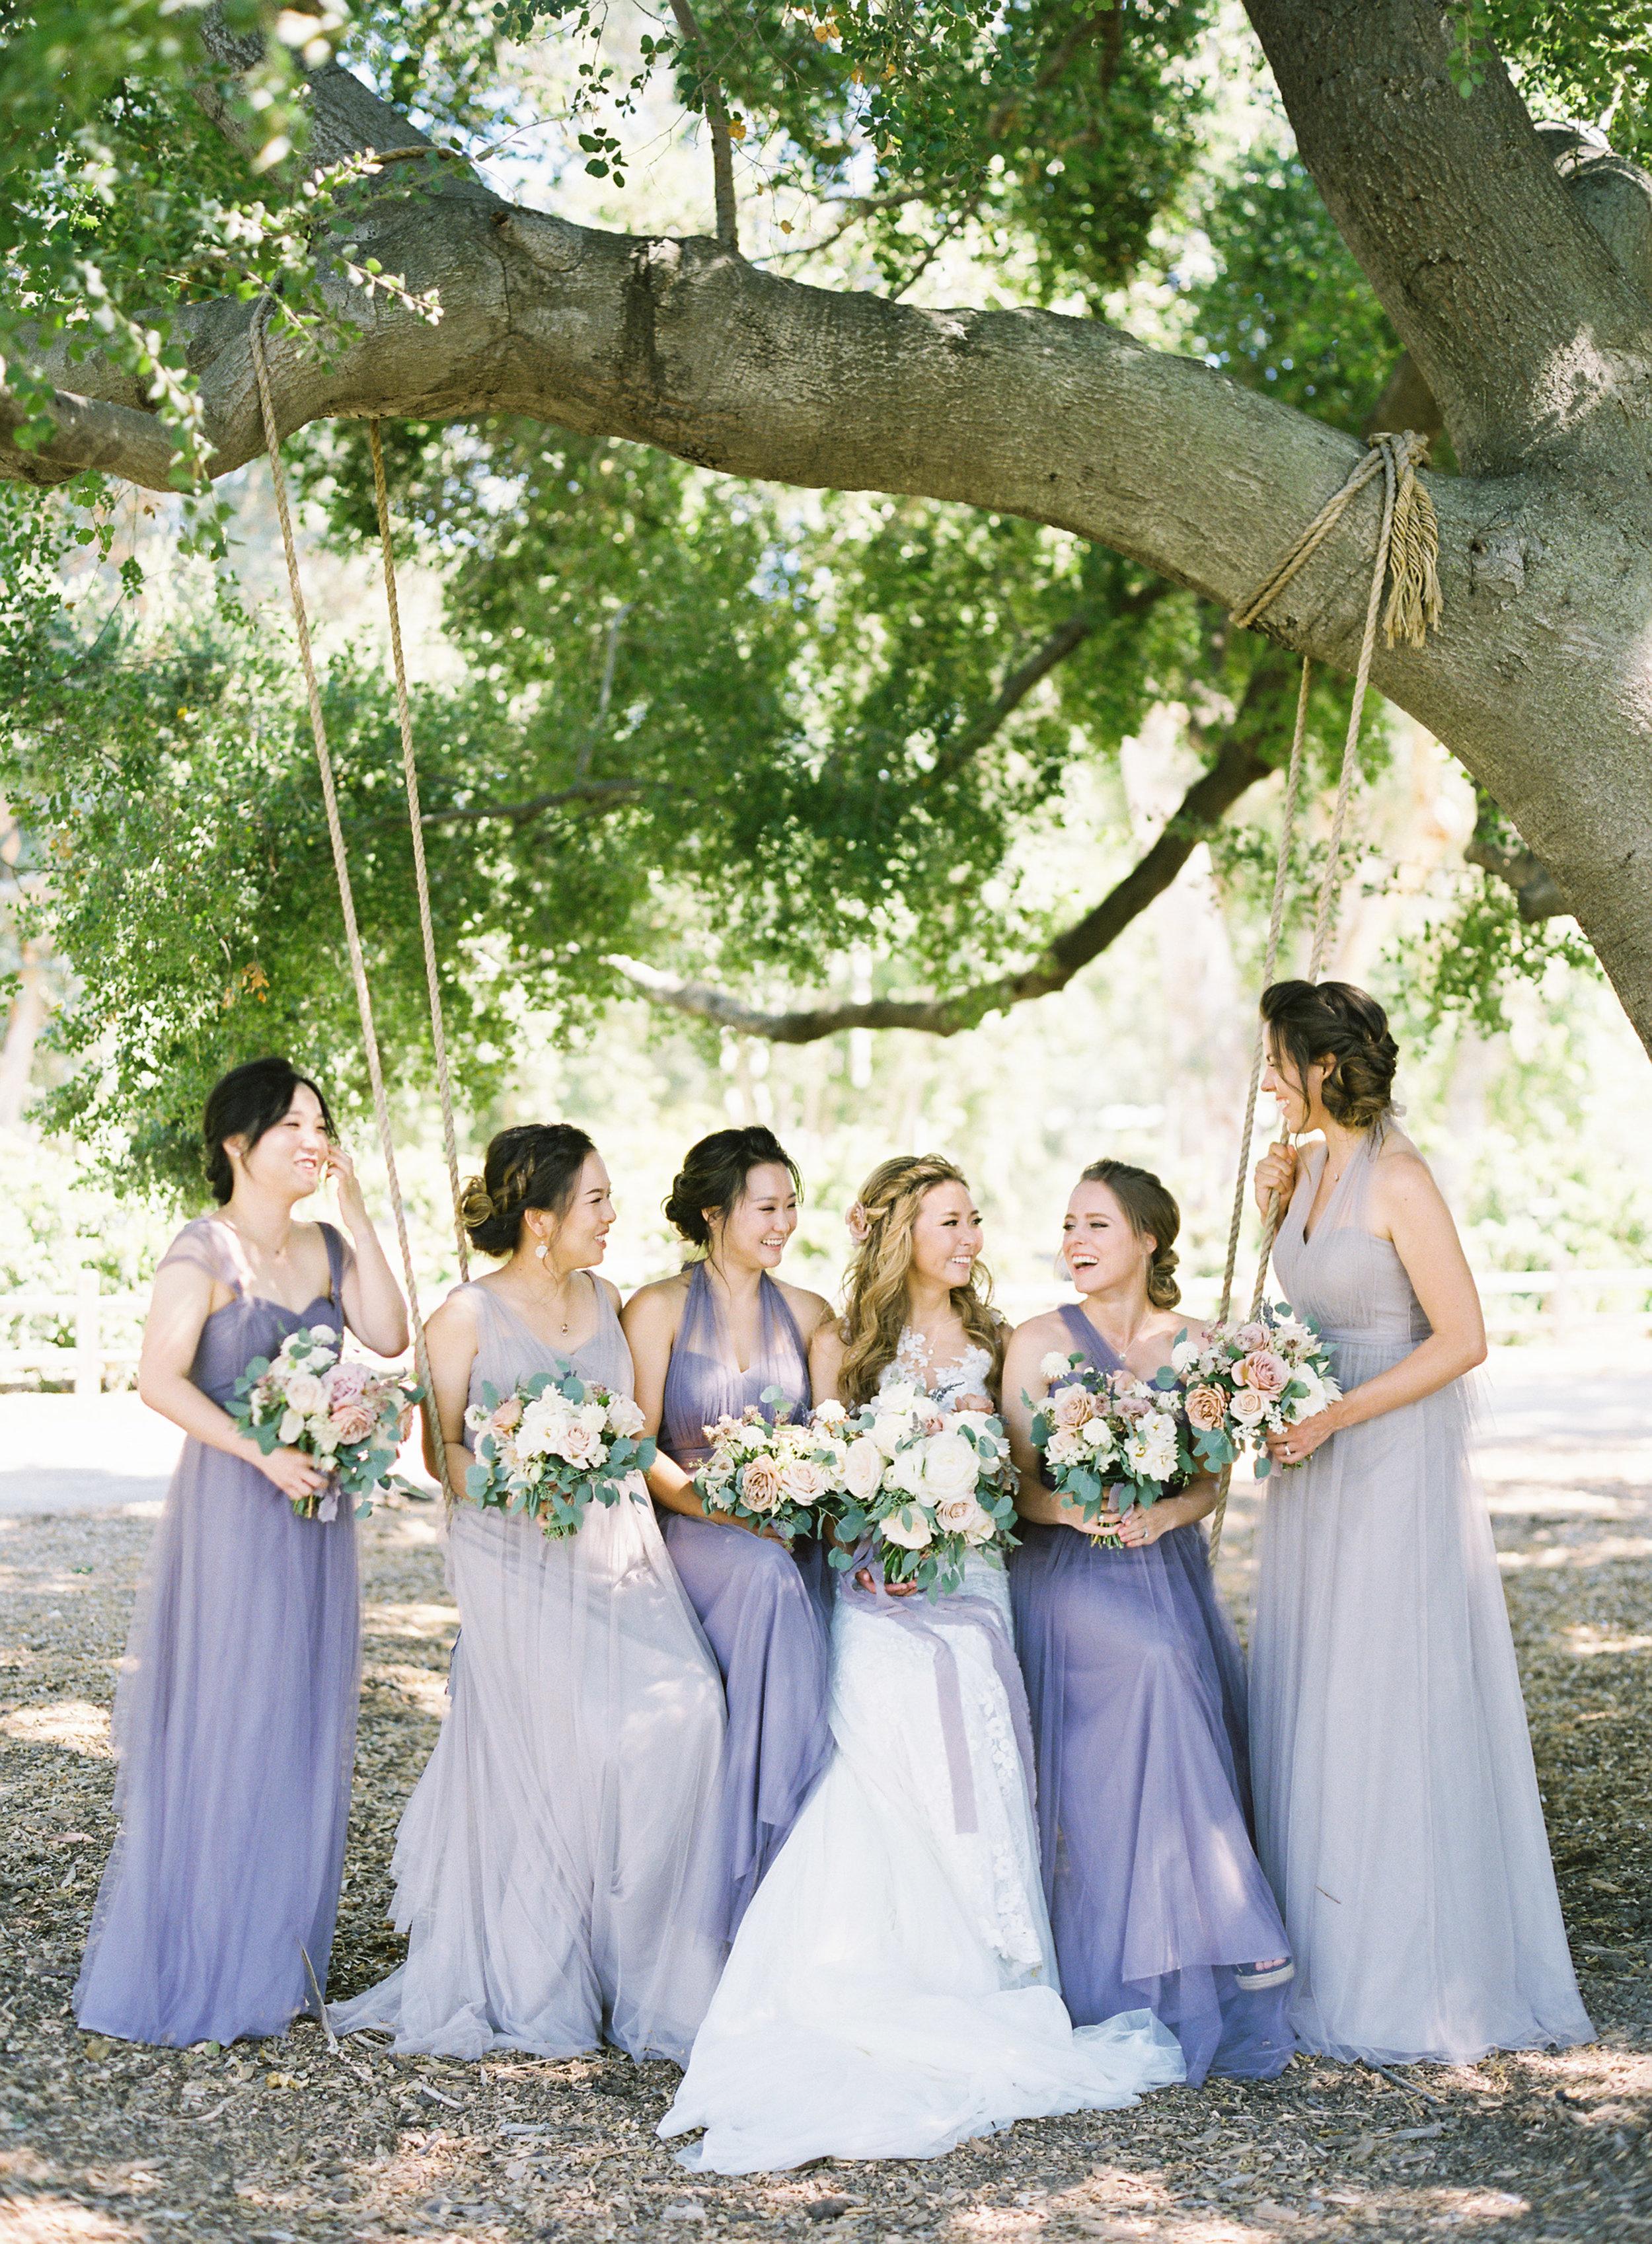 Triunfo_Creek_Winery_Wedding-128-Jen-Huang-JL-341-Jen-Huang-009965-R1-013.jpg